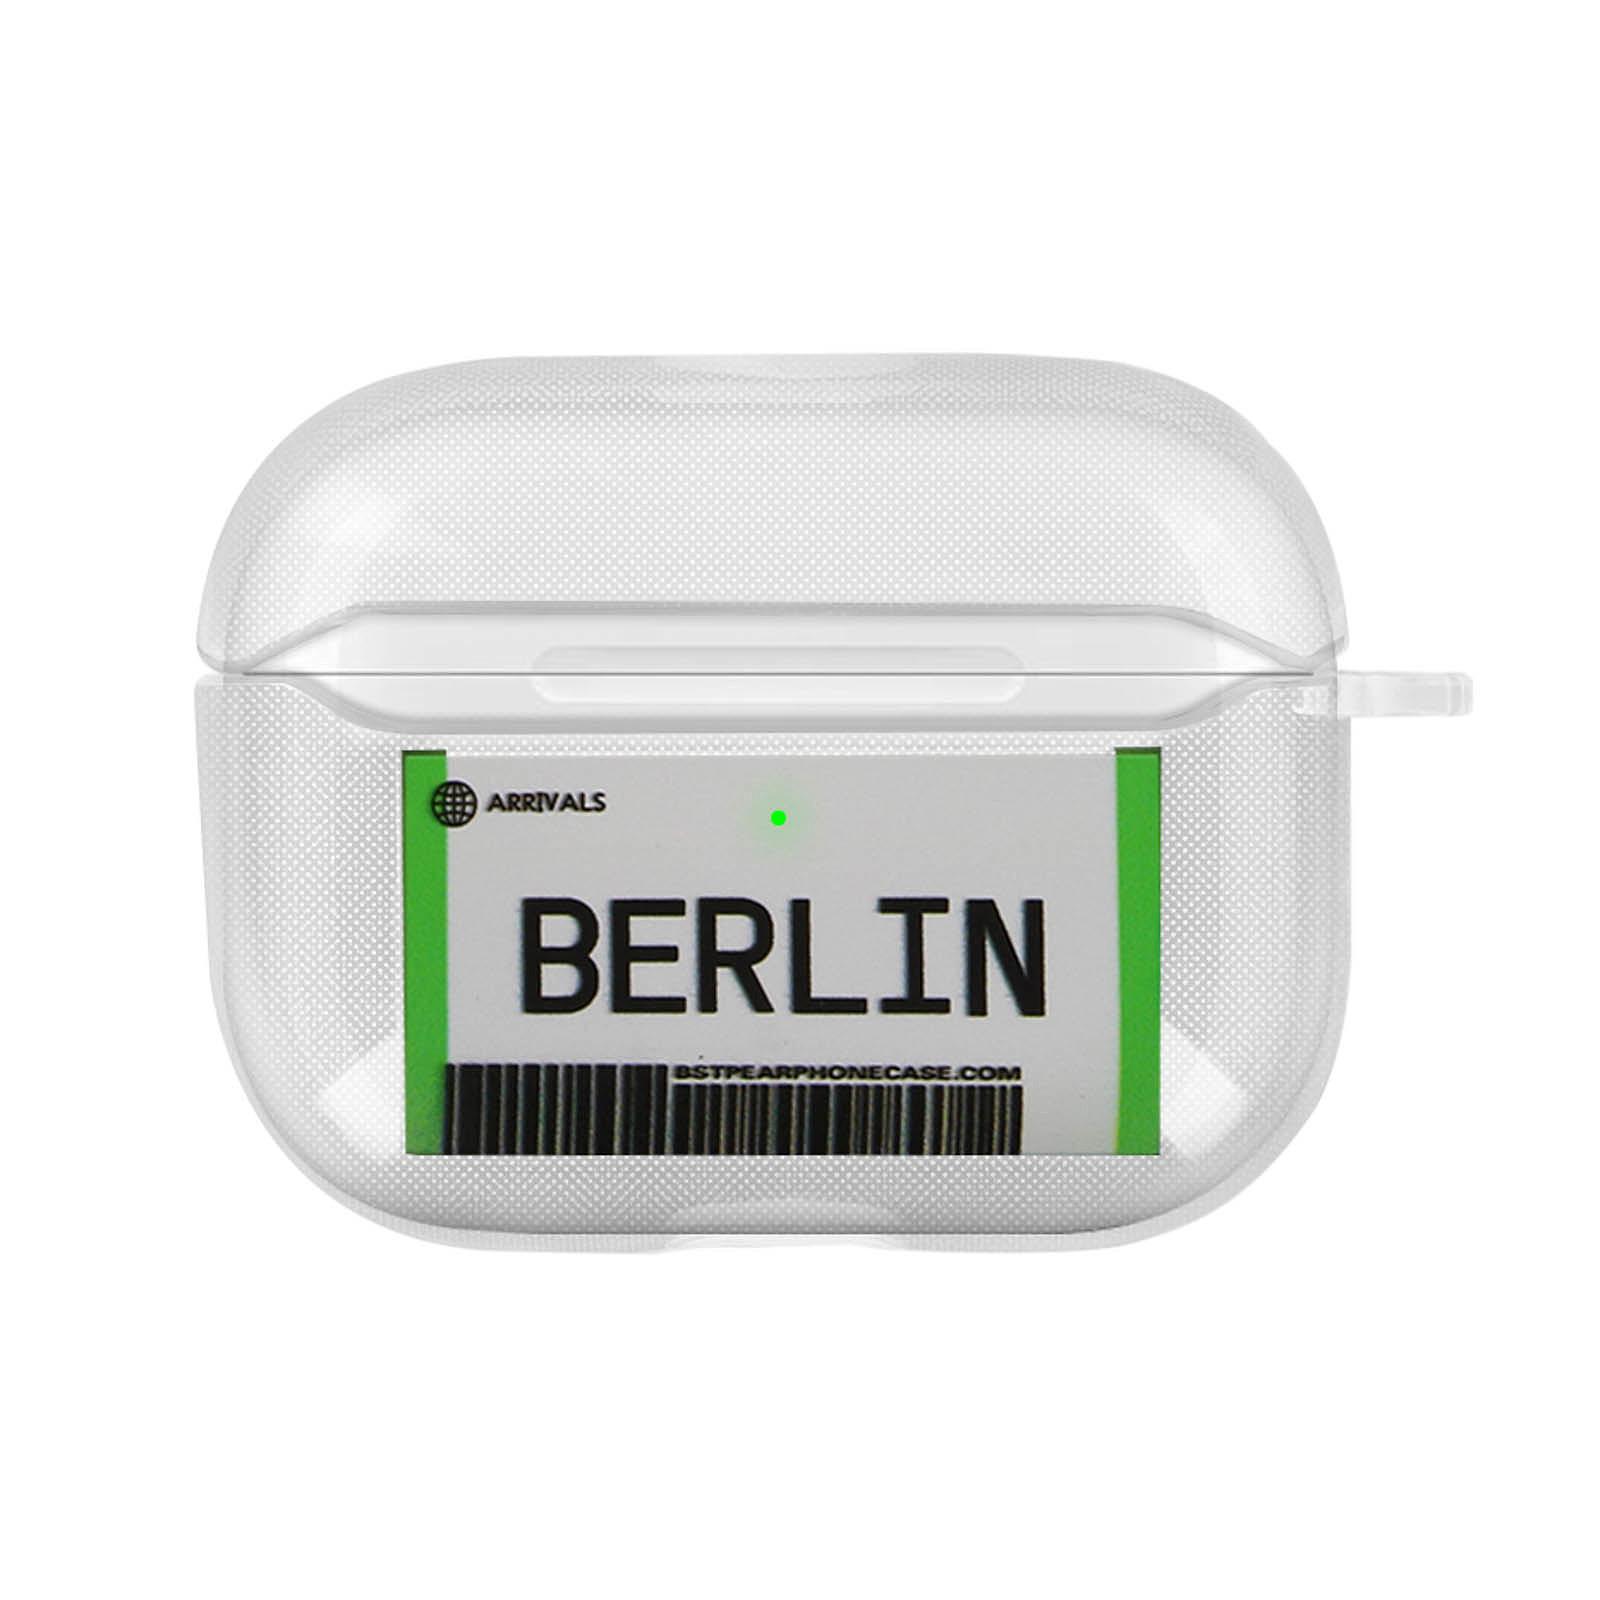 Avizar Coque Berlin pour AirPods Pro